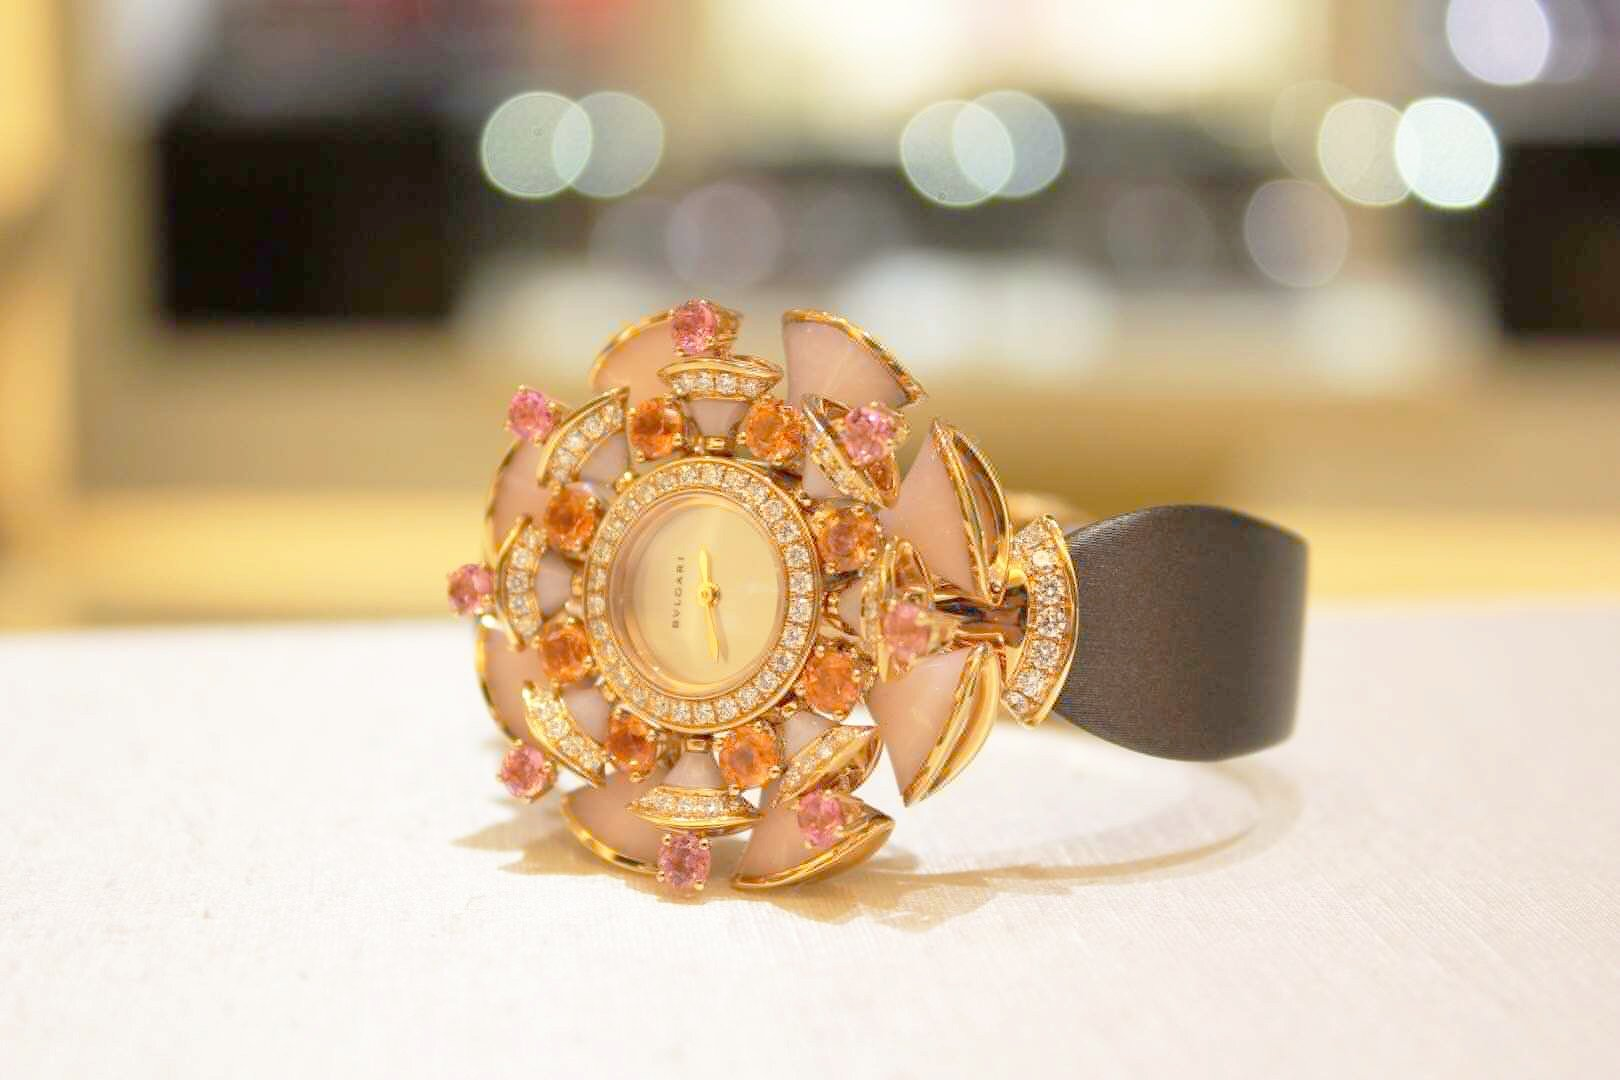 BVLGARI宝格丽女表DIVAS'DREAM 珠宝腕表系列 39mm 102420插图1